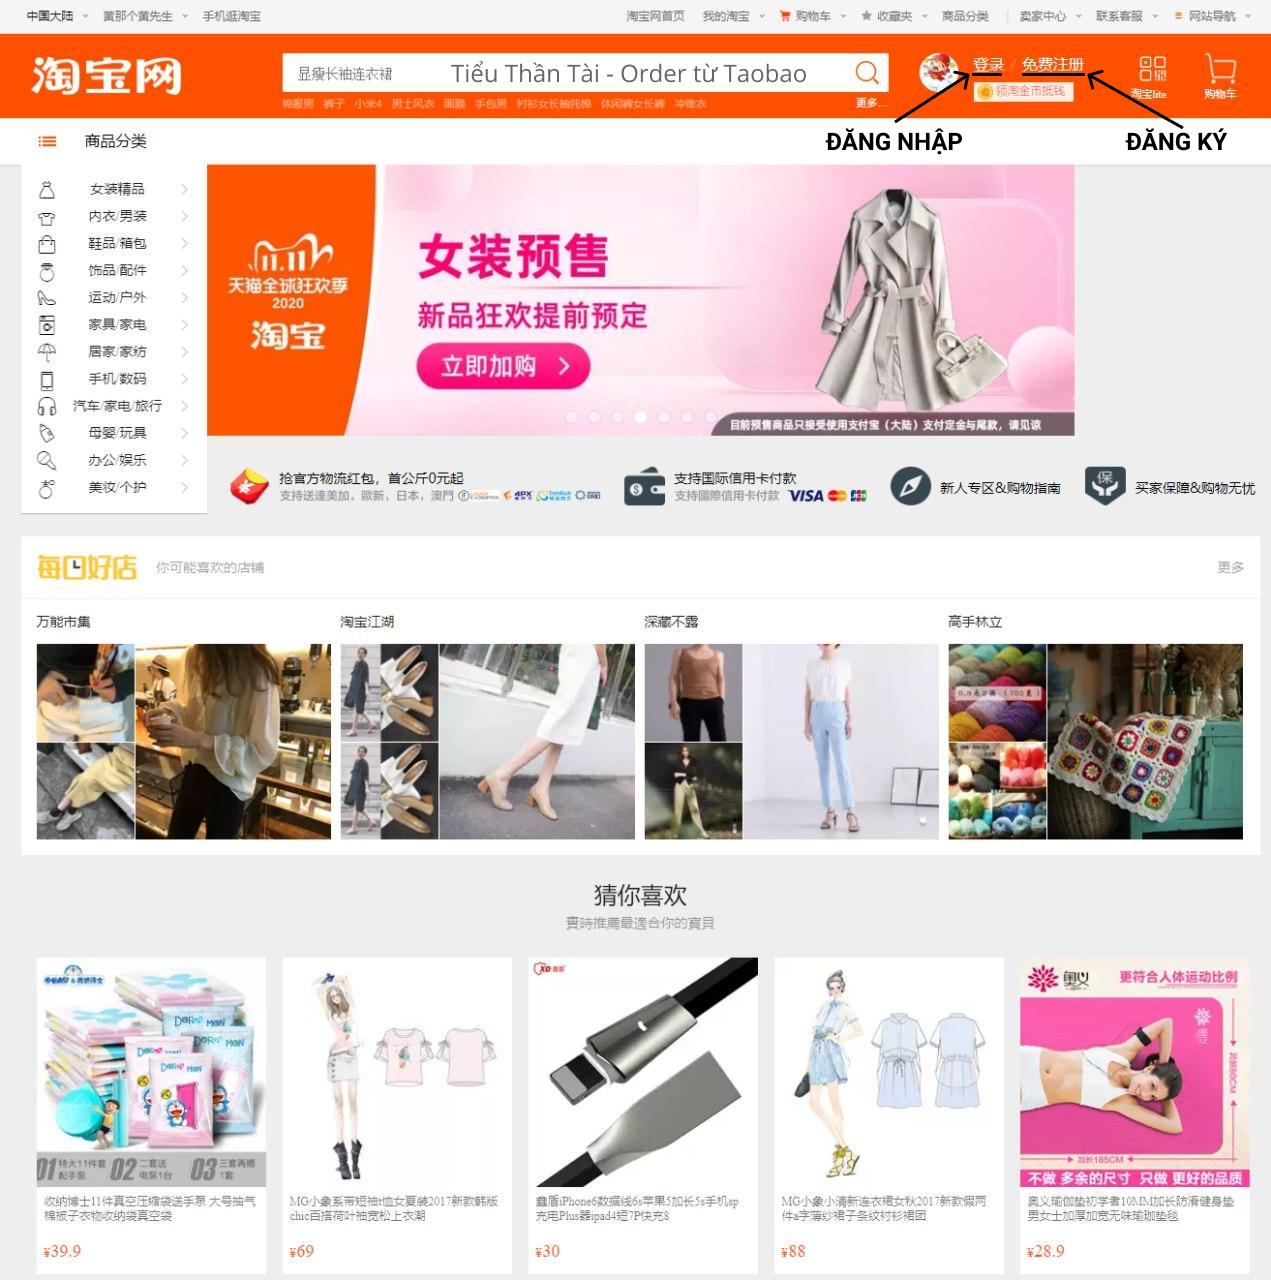 truy cập trang taobao